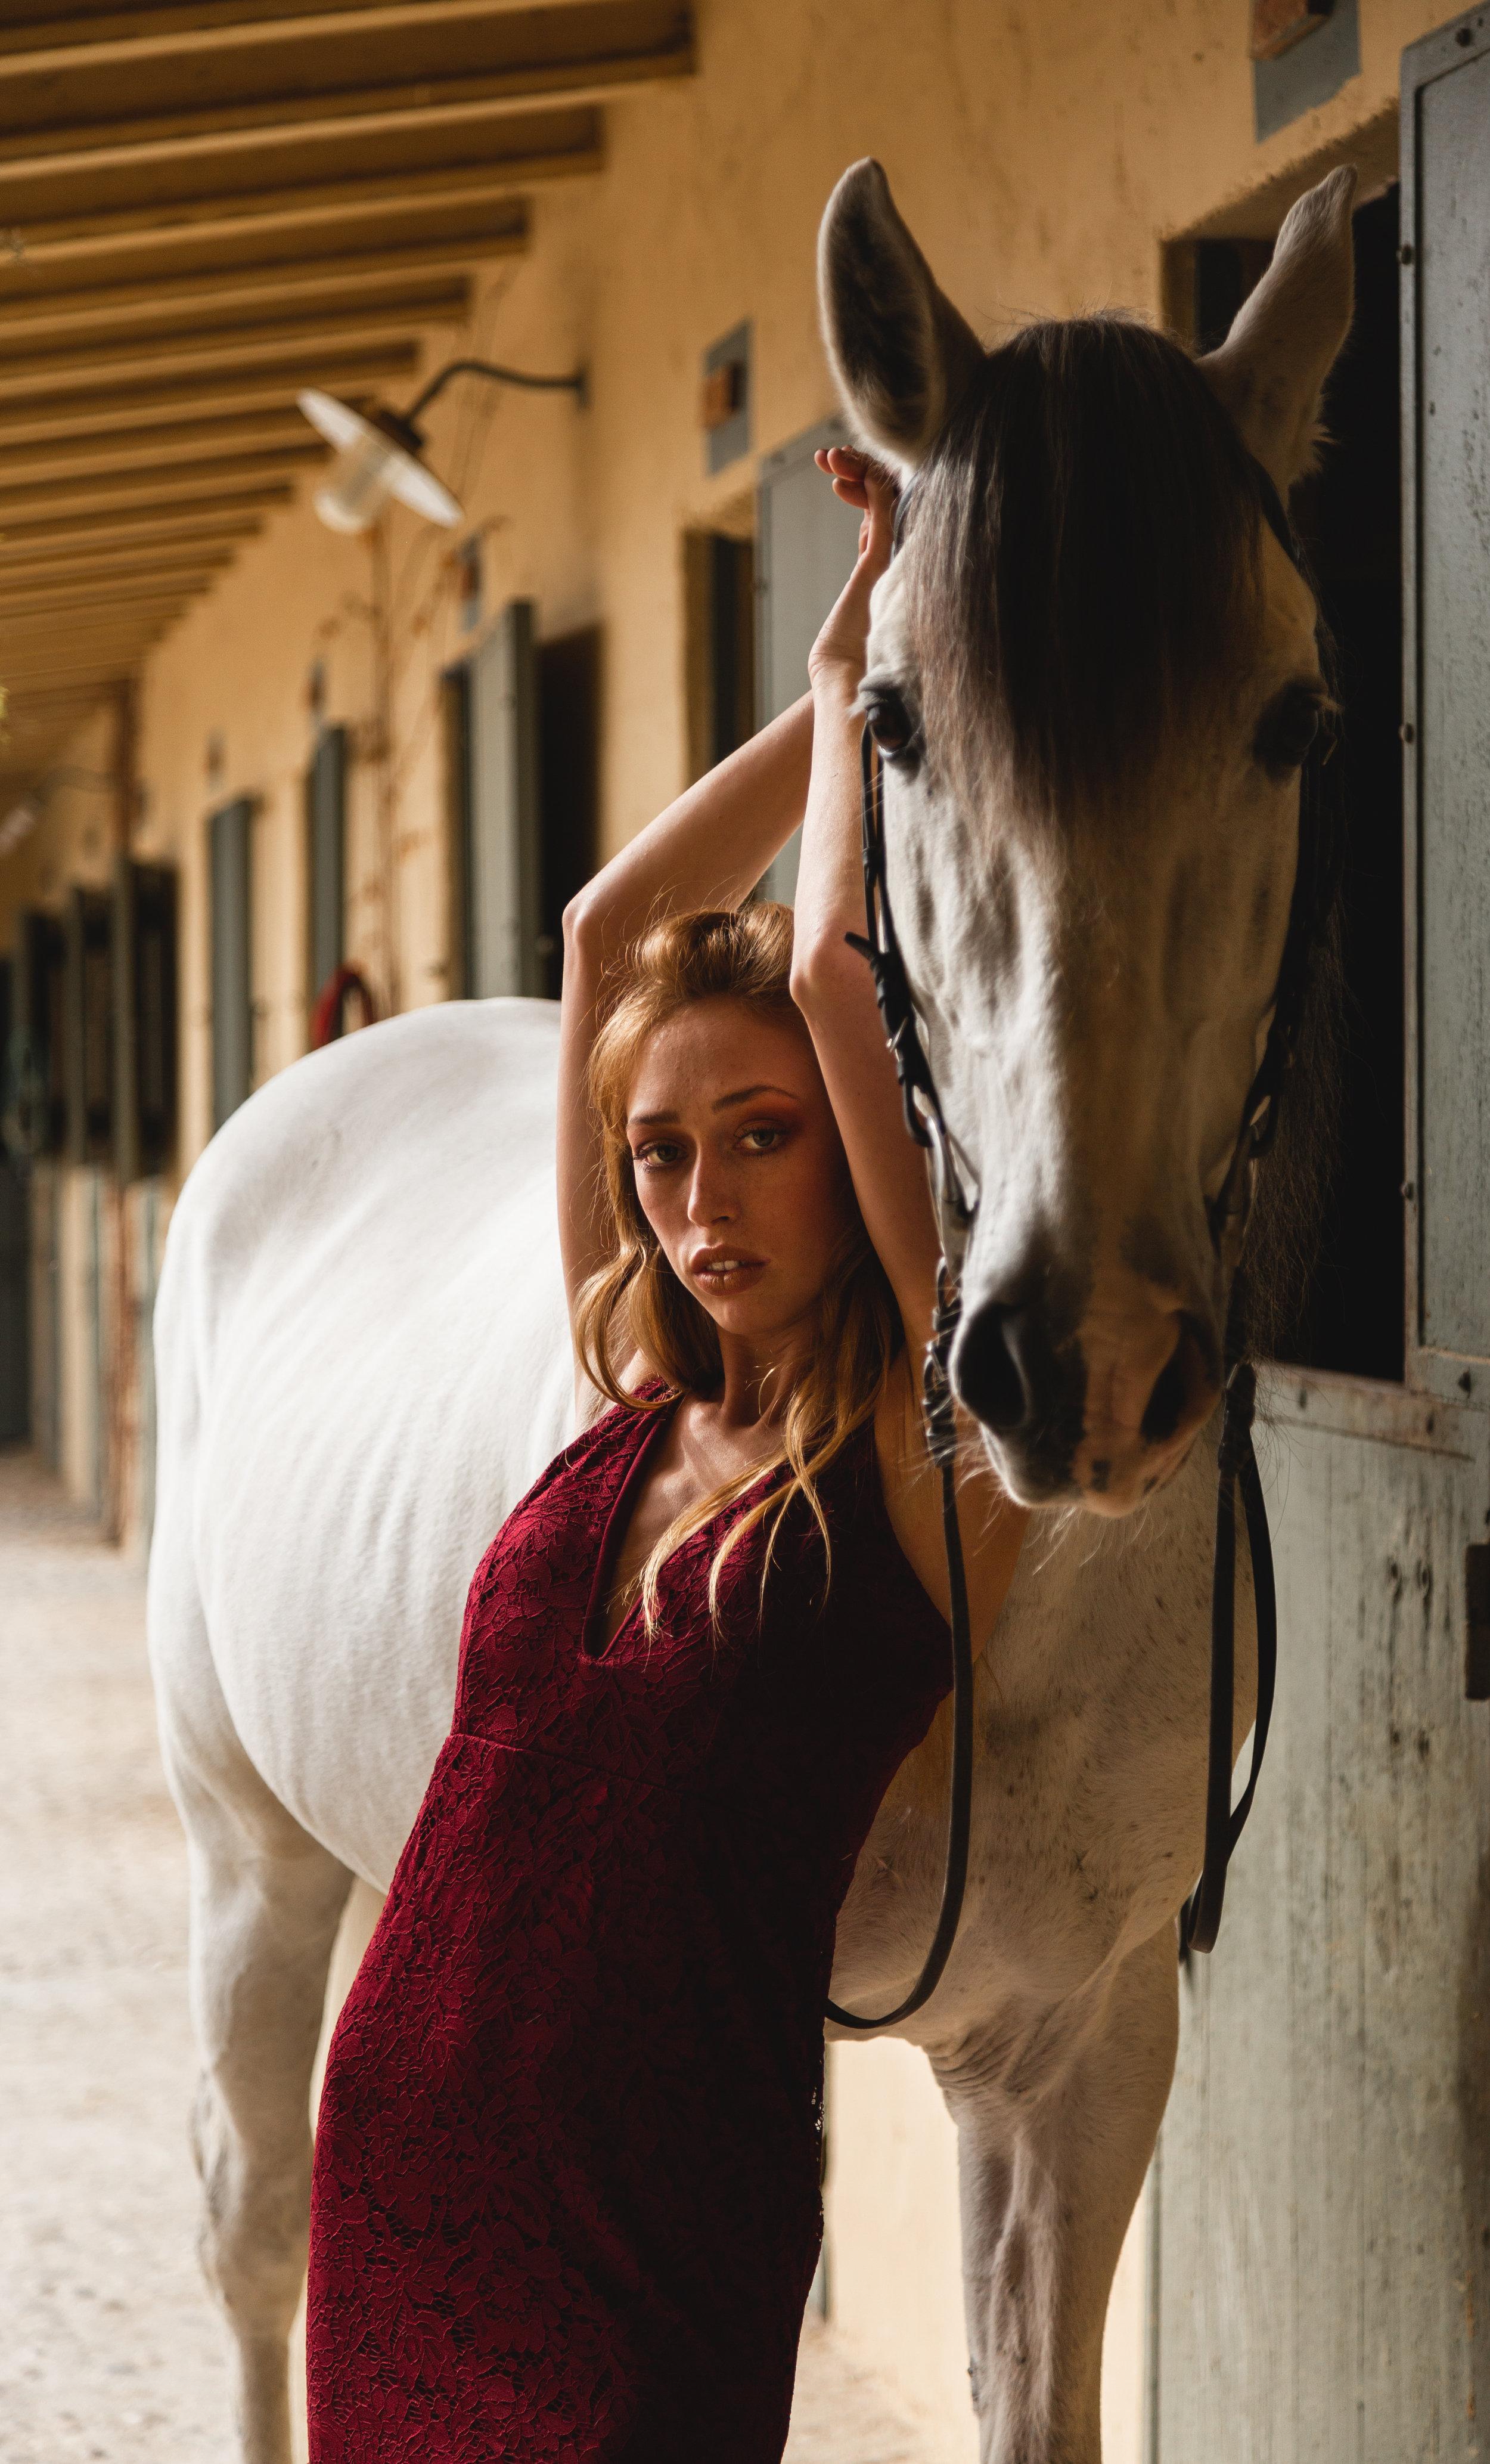 Helene_HorseEditorial_2019_12.JPG